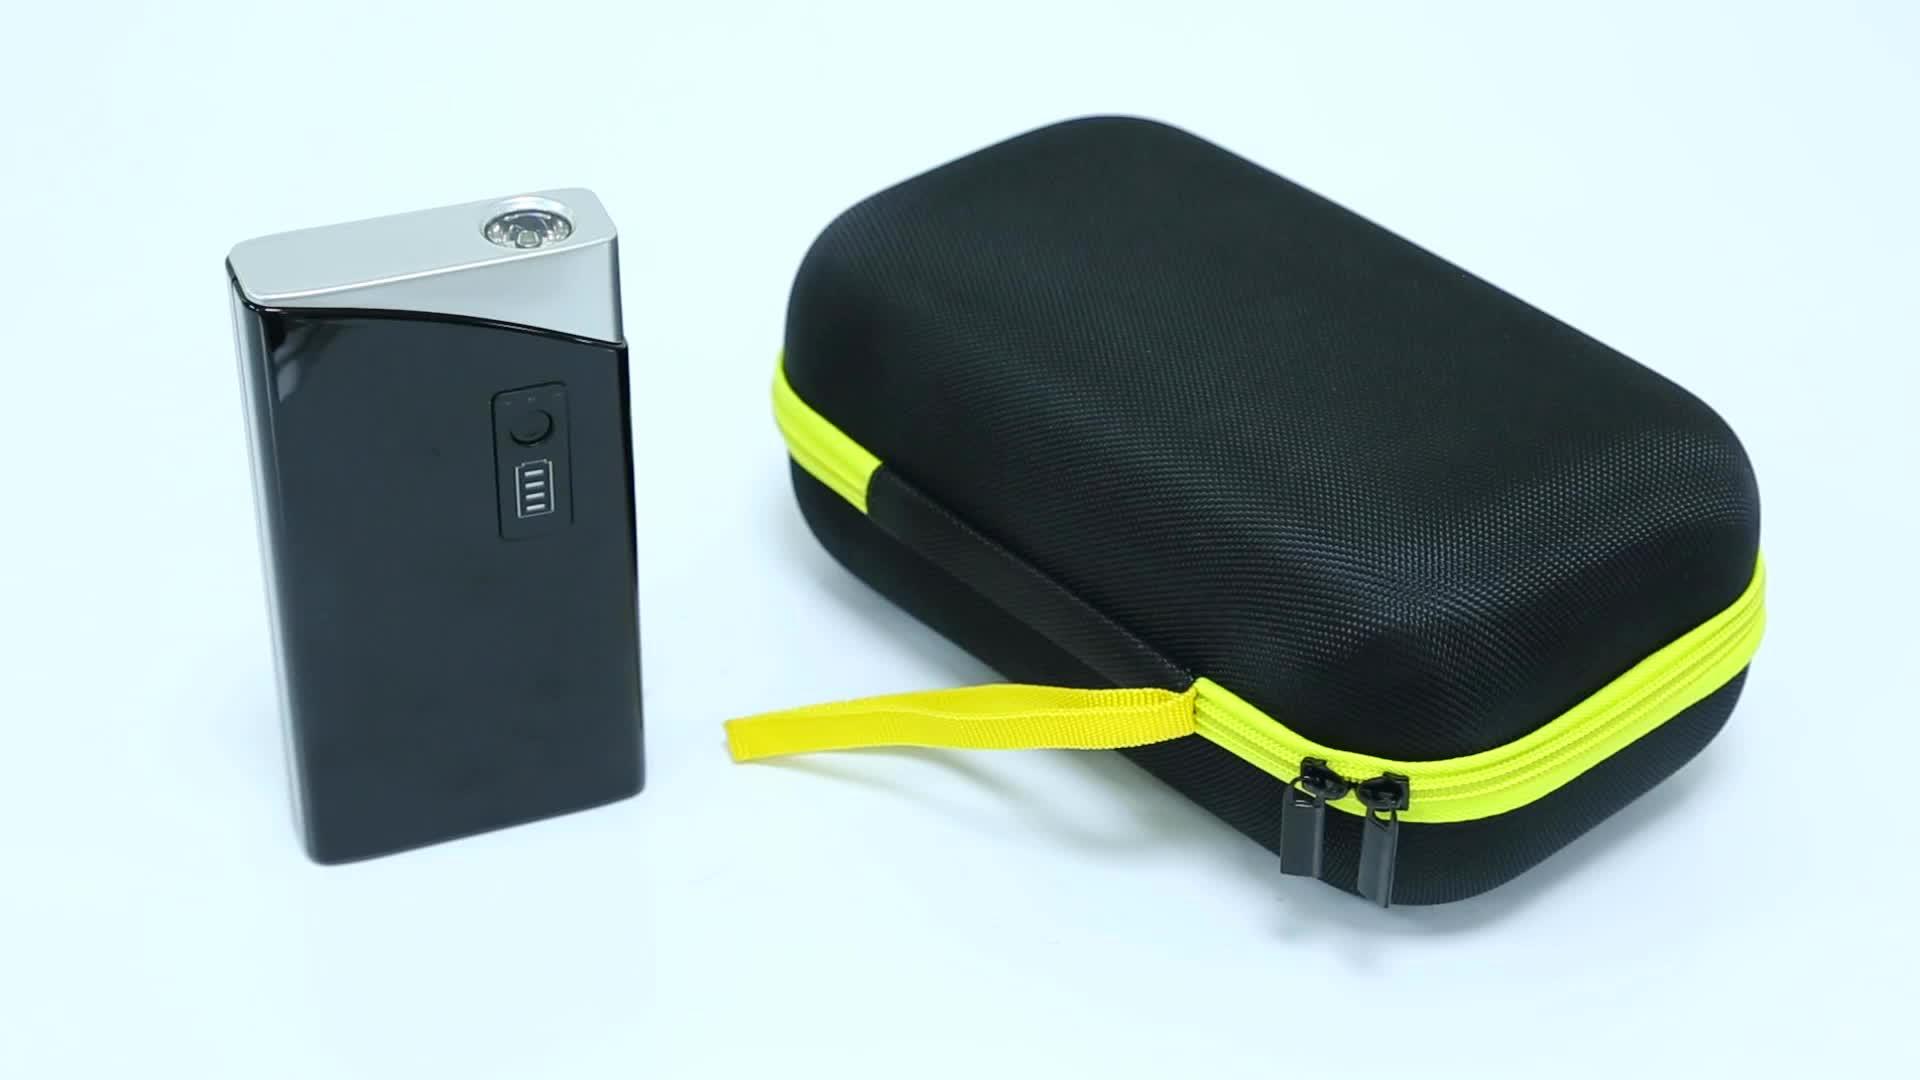 Melompat Starter Mobil Ponsel Puncak Arus 2000A 600A Mobil Jumper 24000 MAh 16800 MAh 12 V Melompat Starter